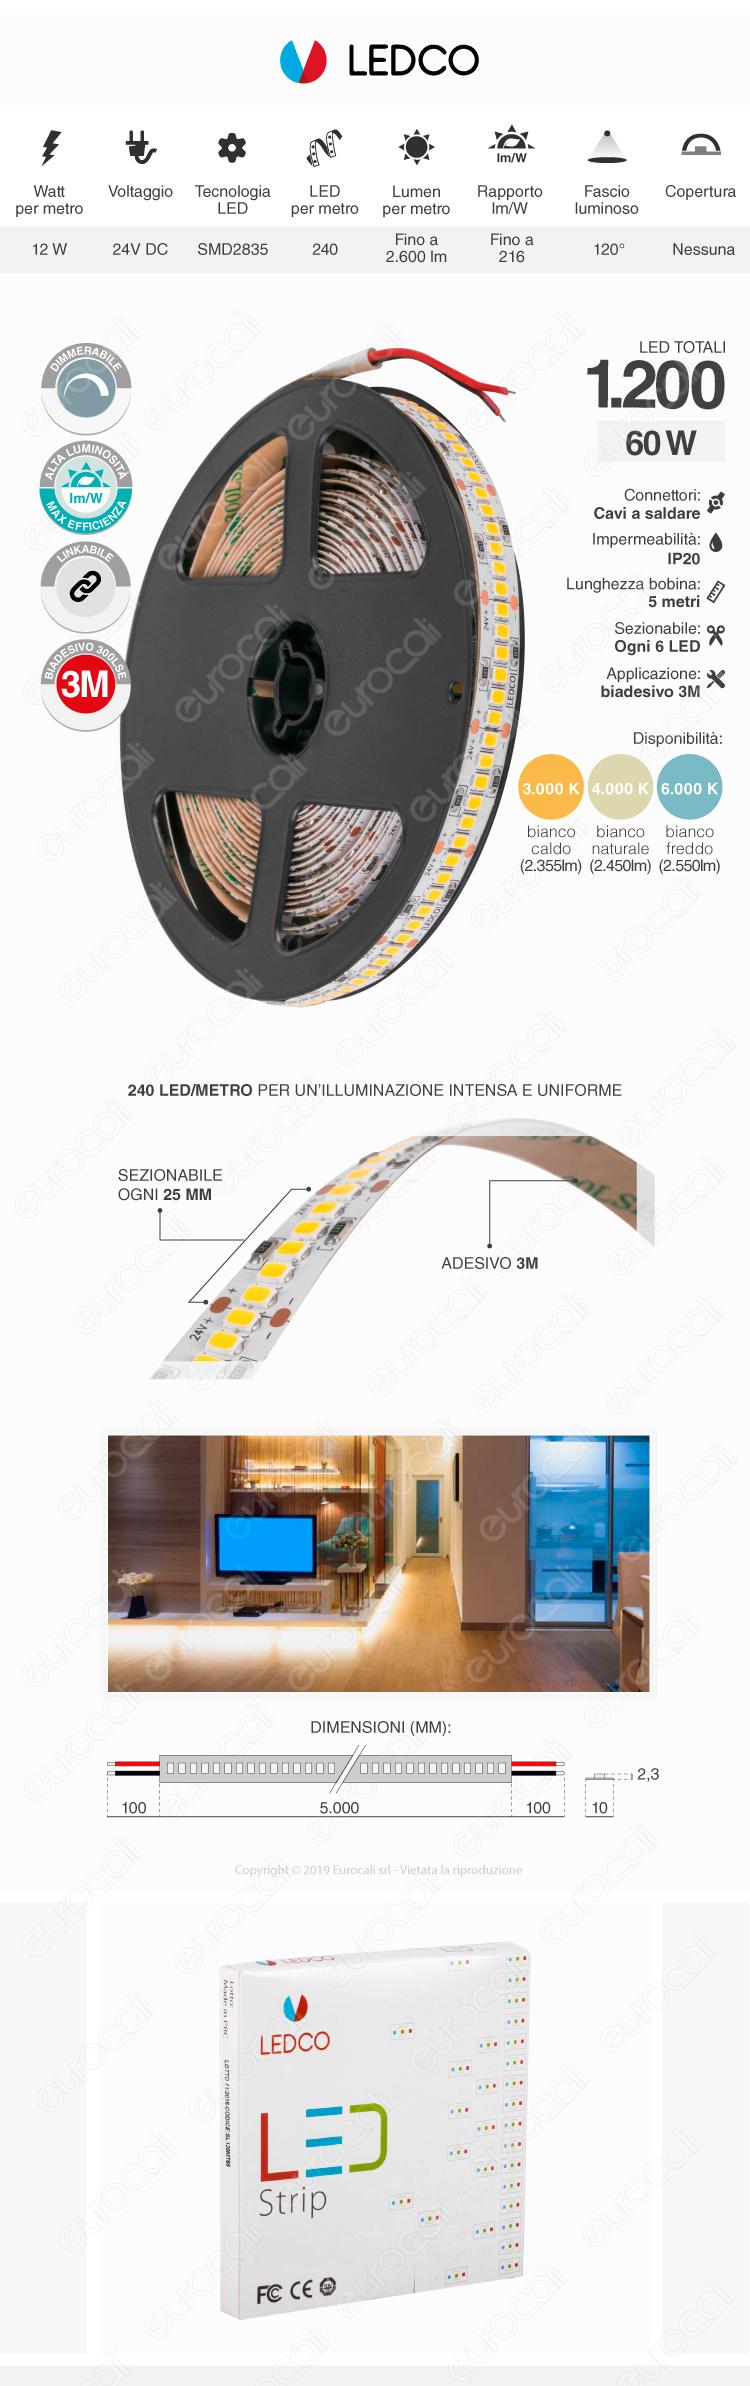 ZNLED Striscia LED 2835 Monocolore 120 LED/metro 24V - Bobina da 30 metri - mod. S411819210 / S411819220